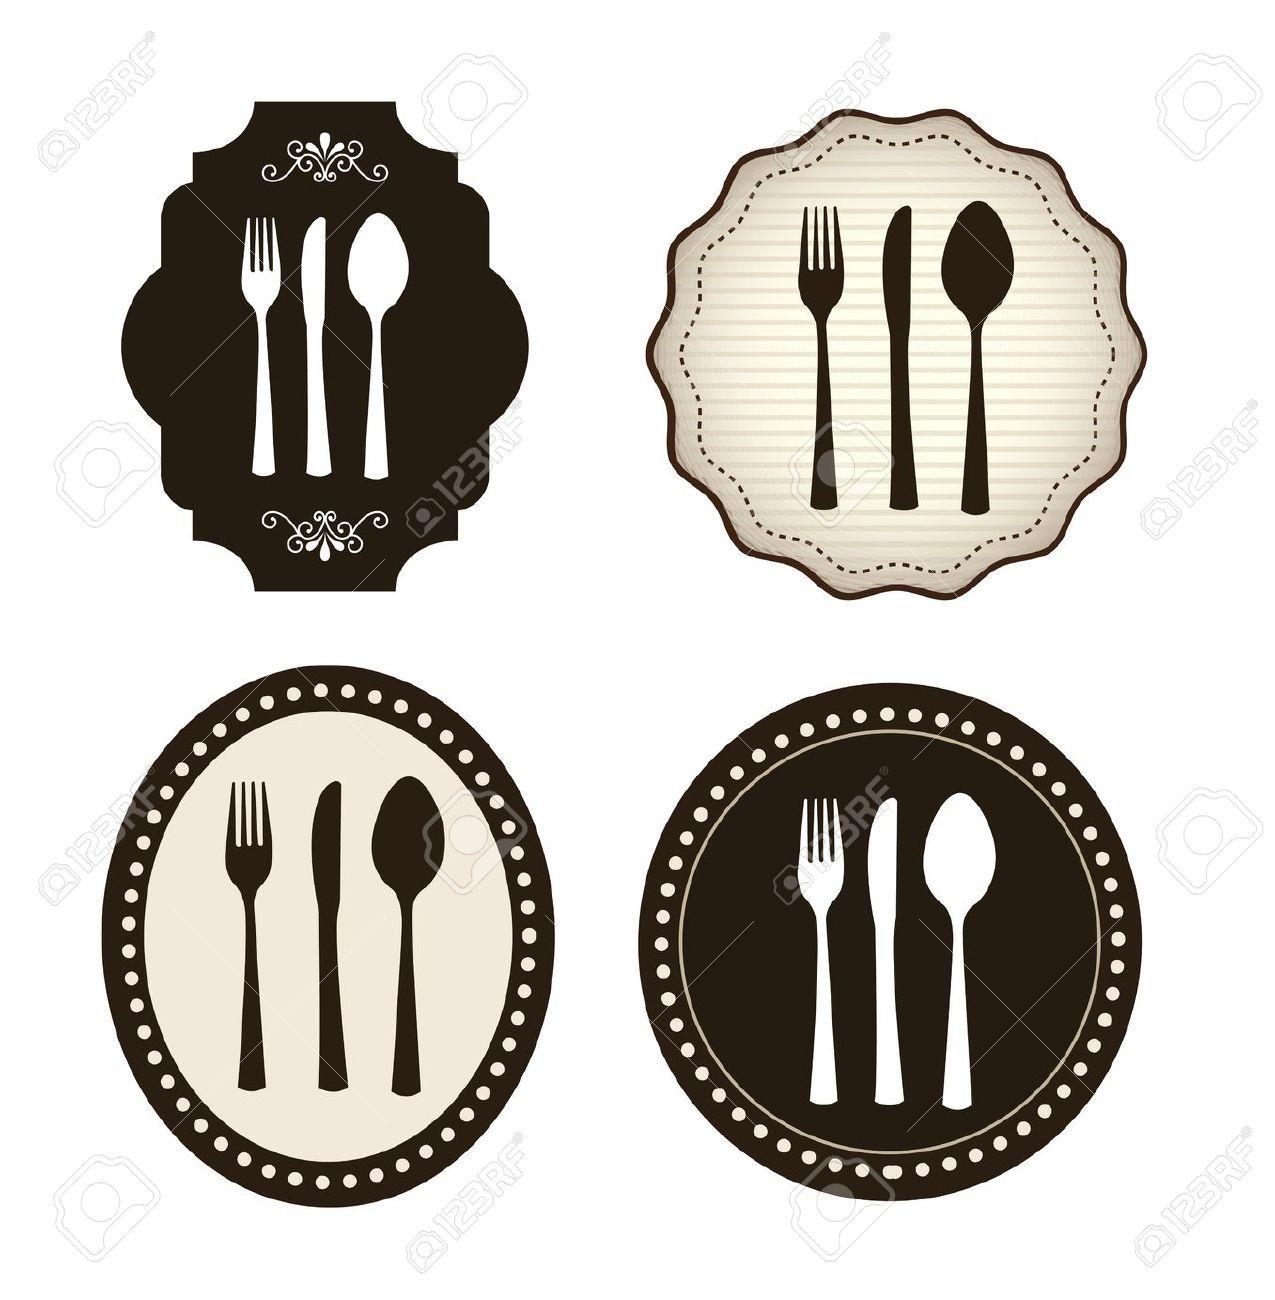 Bord En Bestek Tekening.Bestek Vintage Tekening Google Search Diner Mam Pap Bestek